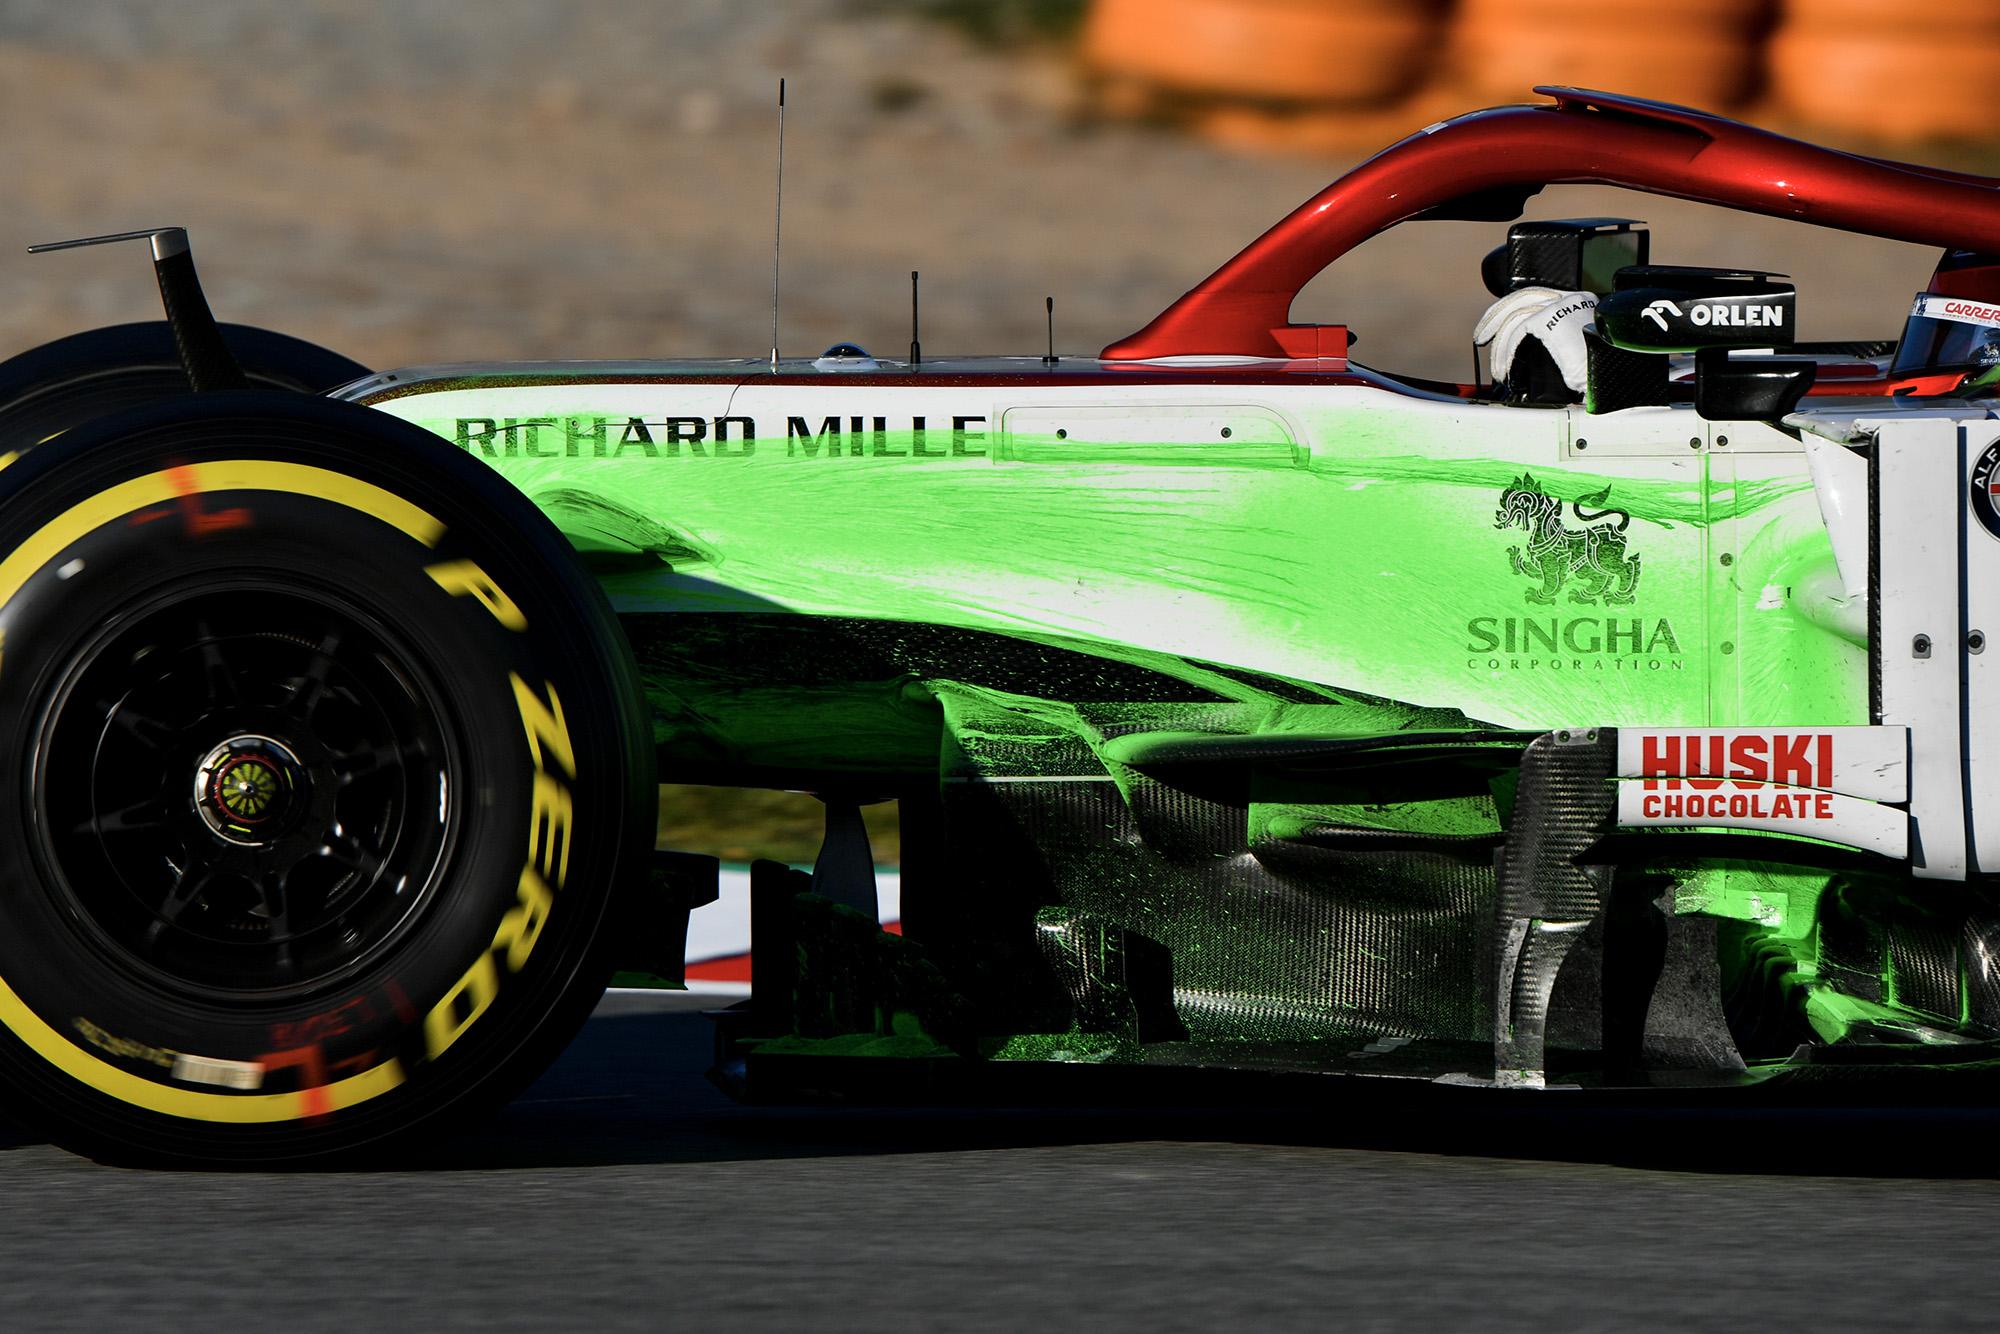 Alfa Romeo with flow-viz paint streaked down the side in 2020 f1 preseason testing